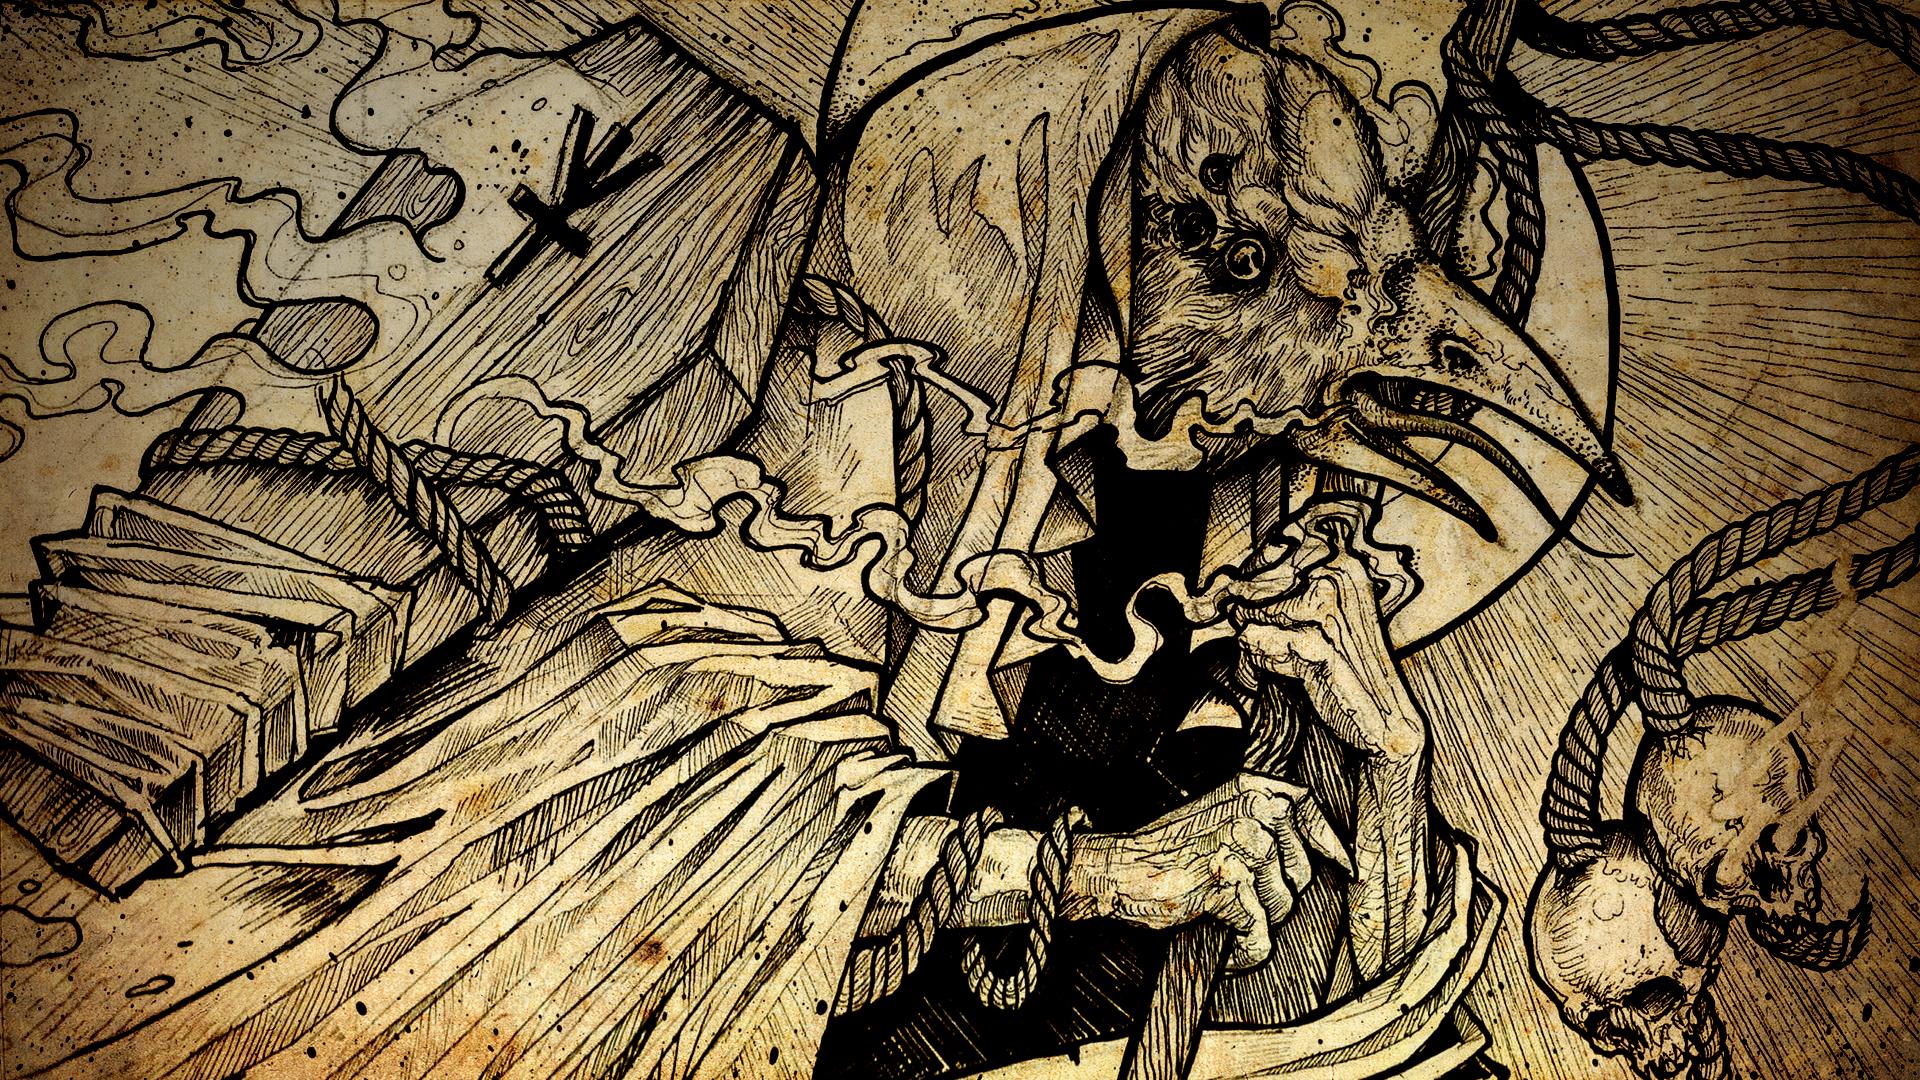 dark goth gothic raven occult skulls skulls reaper wallpaper 1920x1080